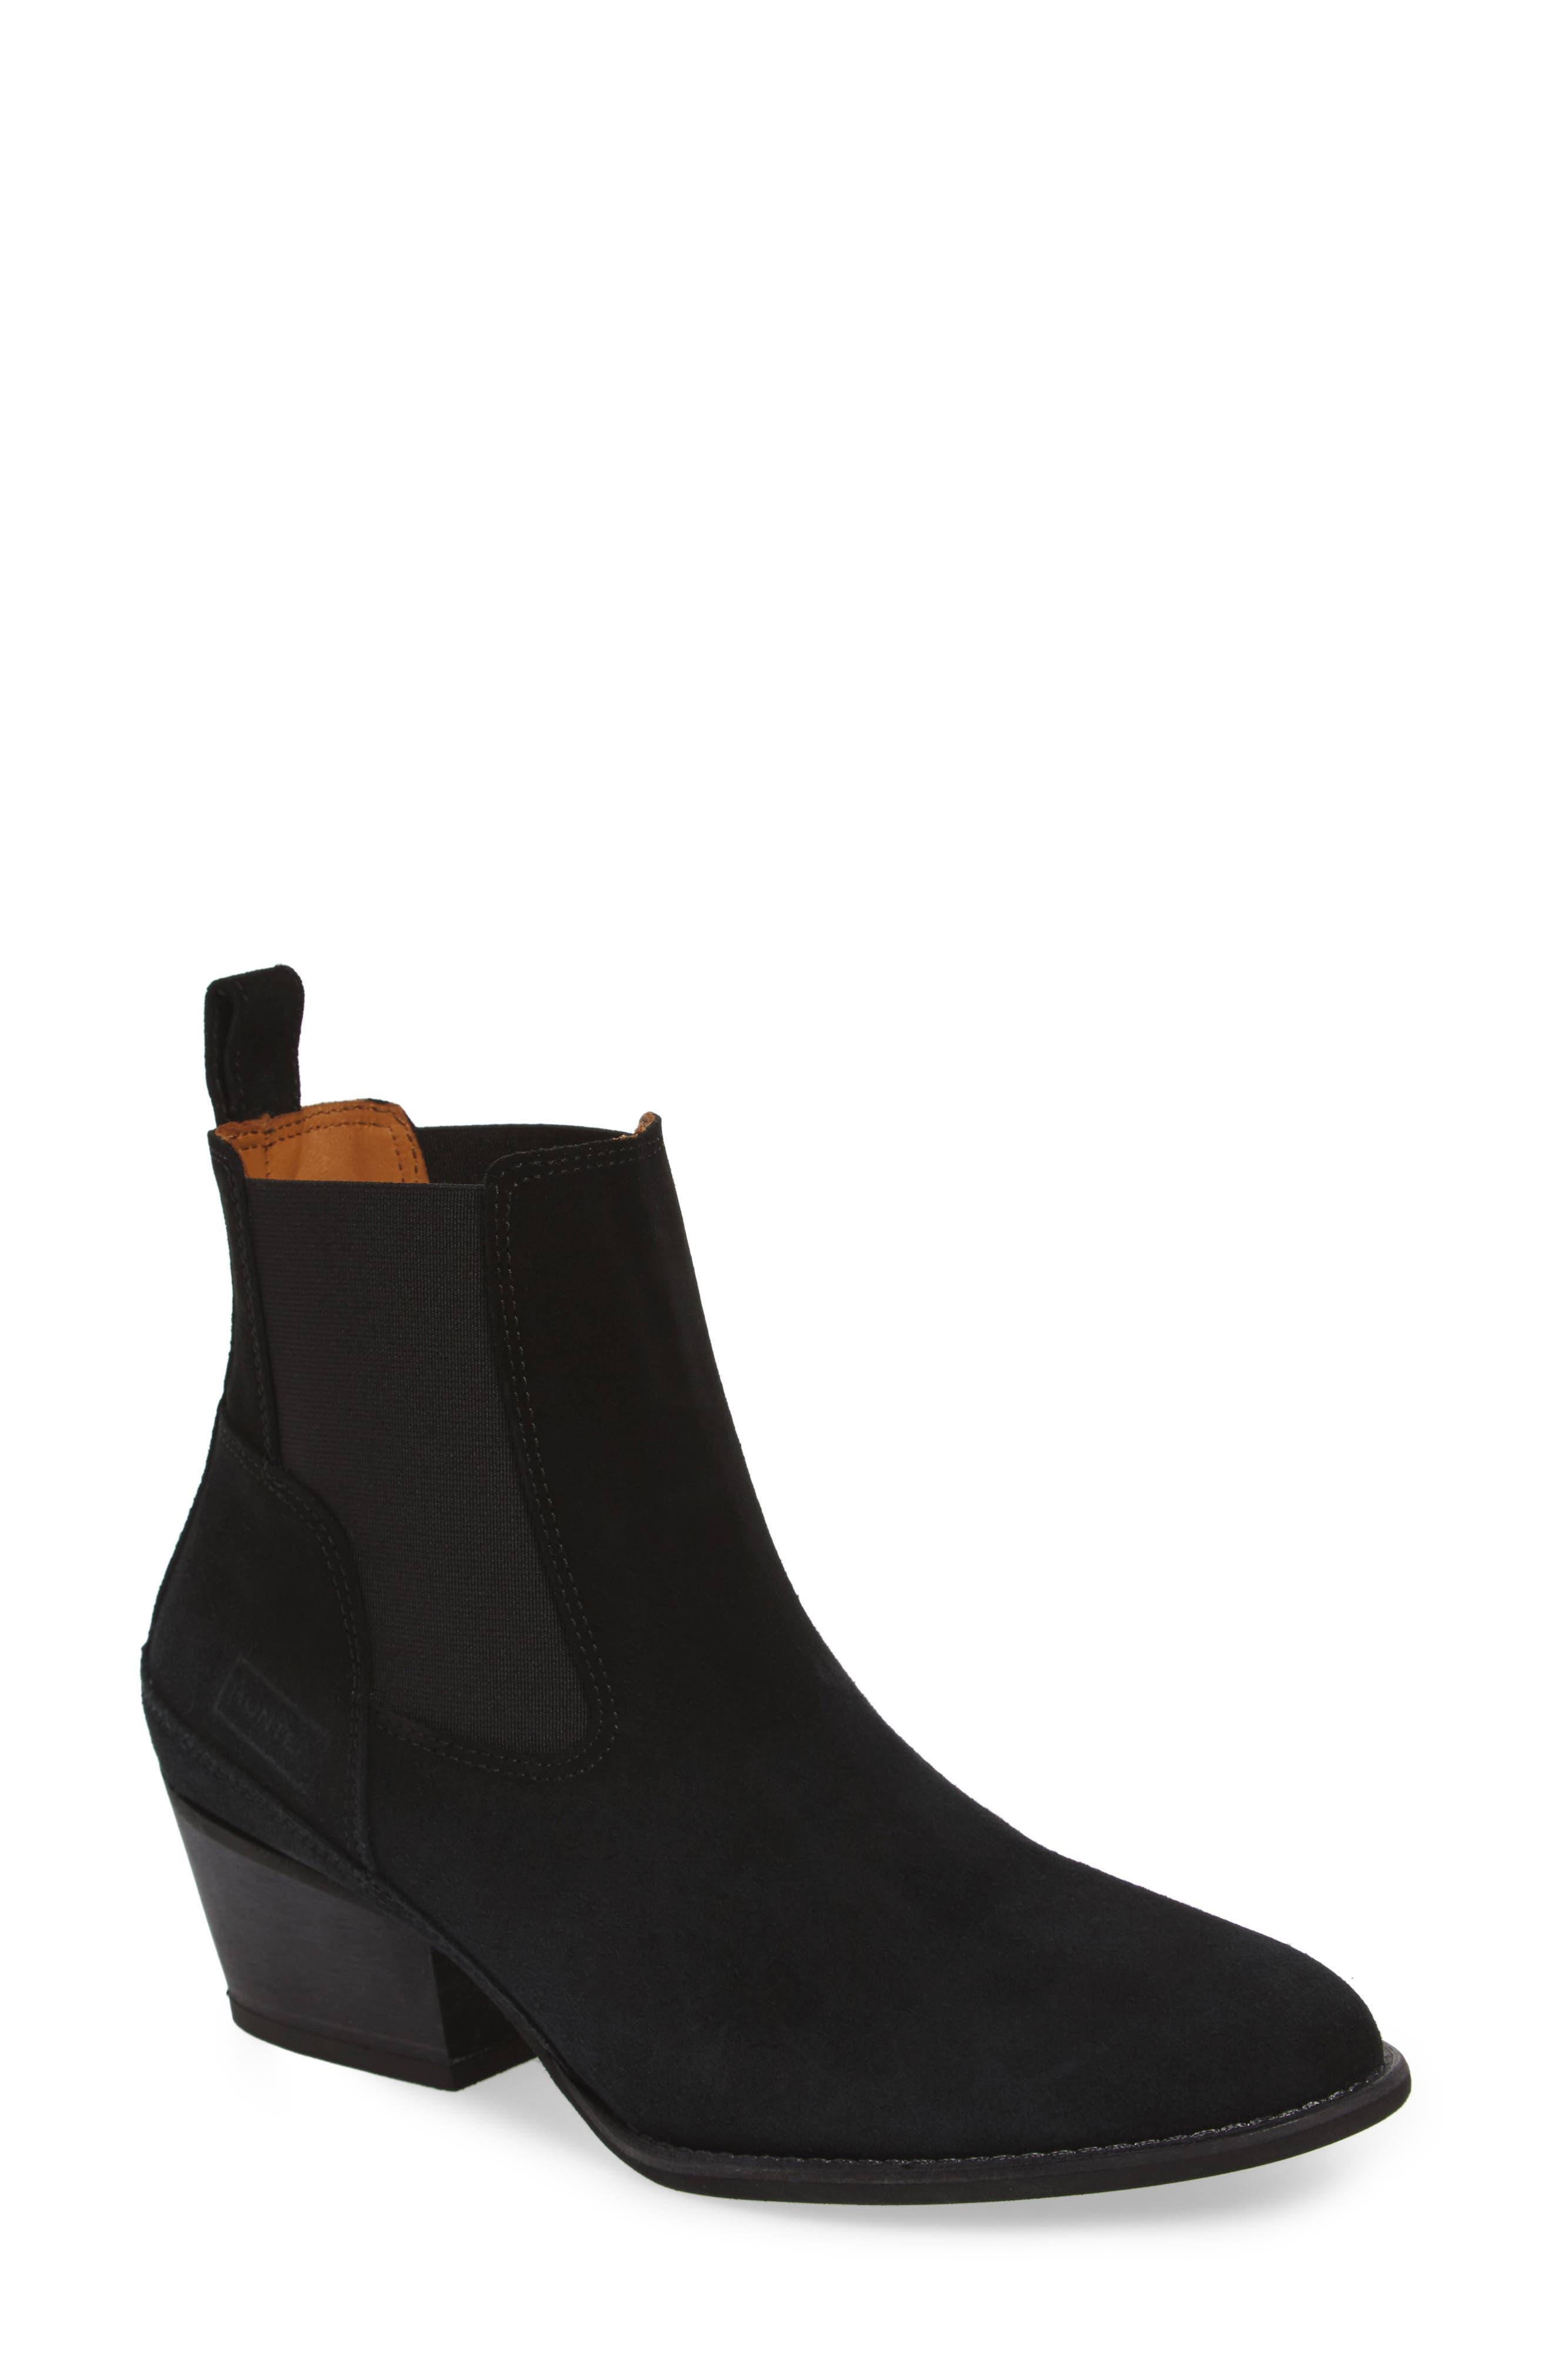 Original Refined Water Resistant Chelsea Boot,                             Main thumbnail 1, color,                             Black Suede